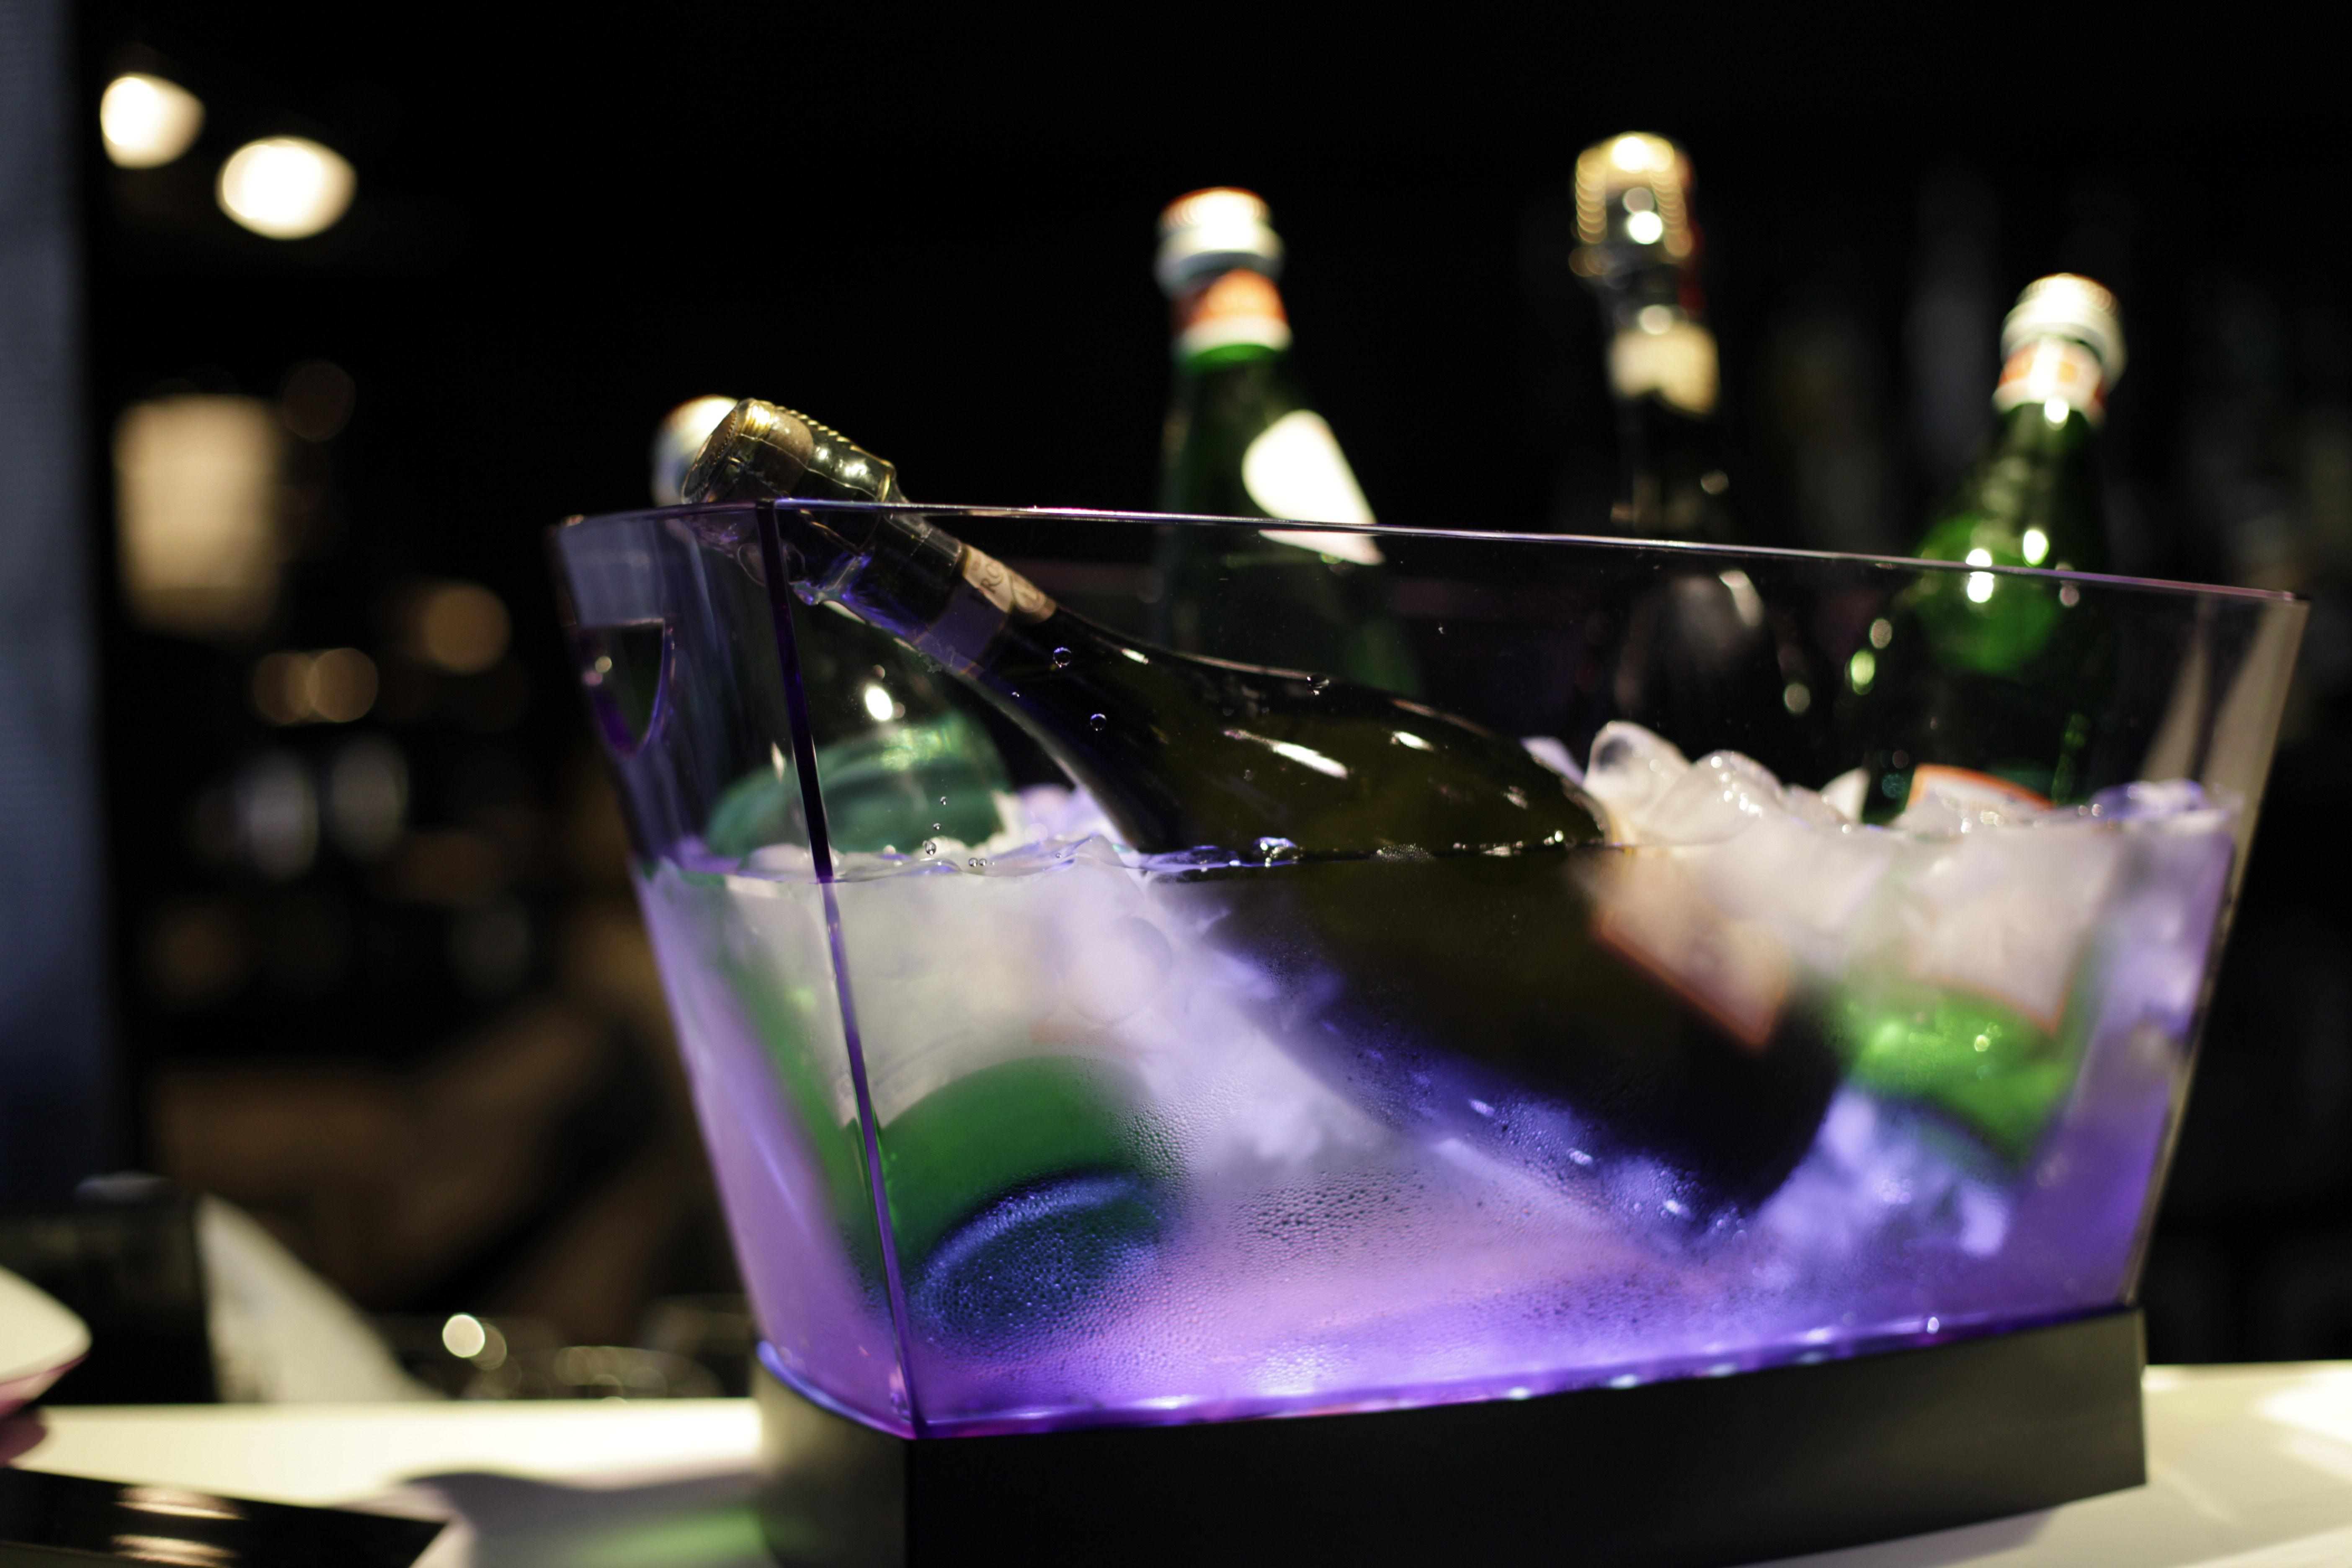 seau champagne gran pagoda 6 bouteilles transparent. Black Bedroom Furniture Sets. Home Design Ideas